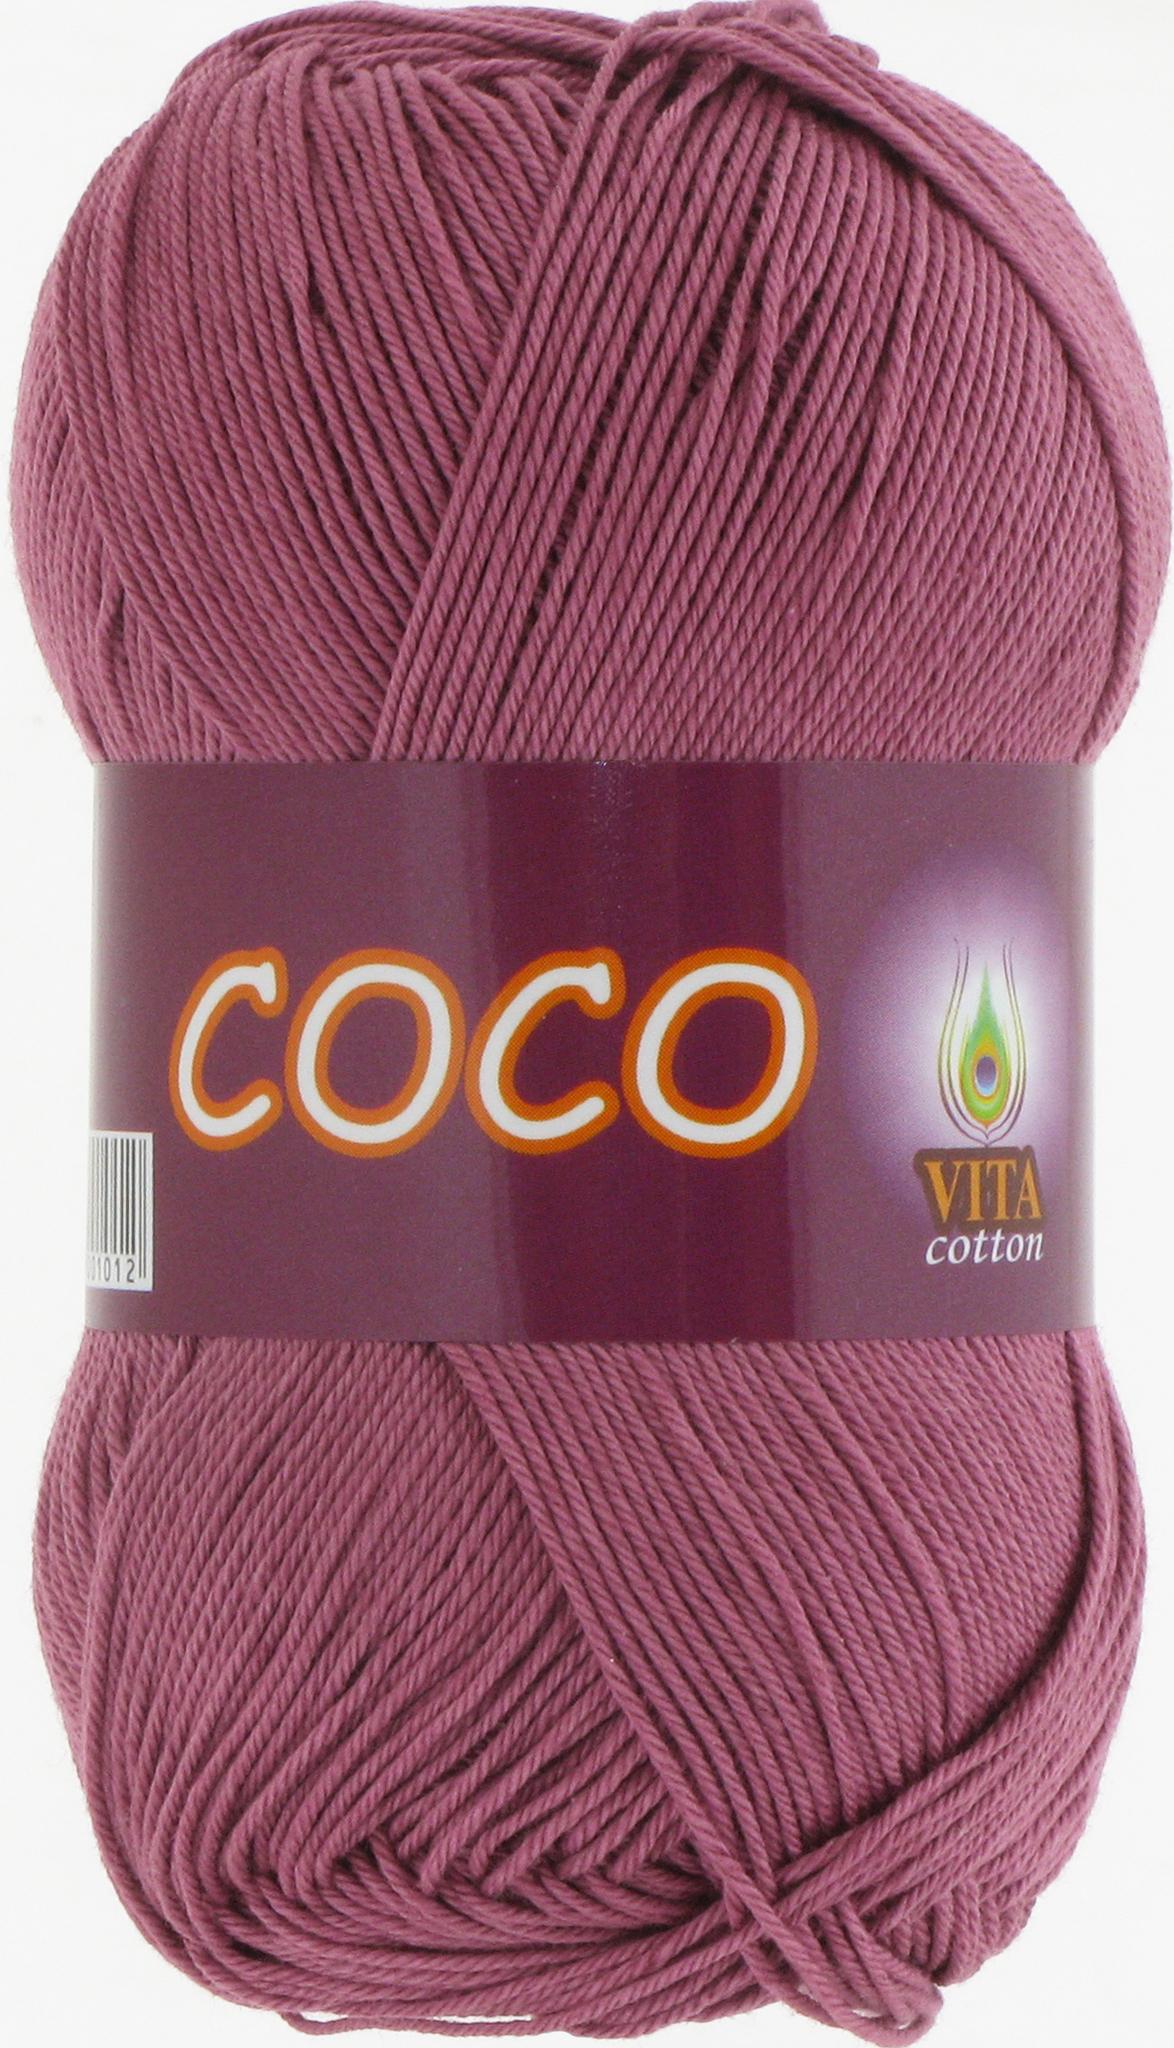 Пряжа Vita Coco 4326 дымчато-розовый